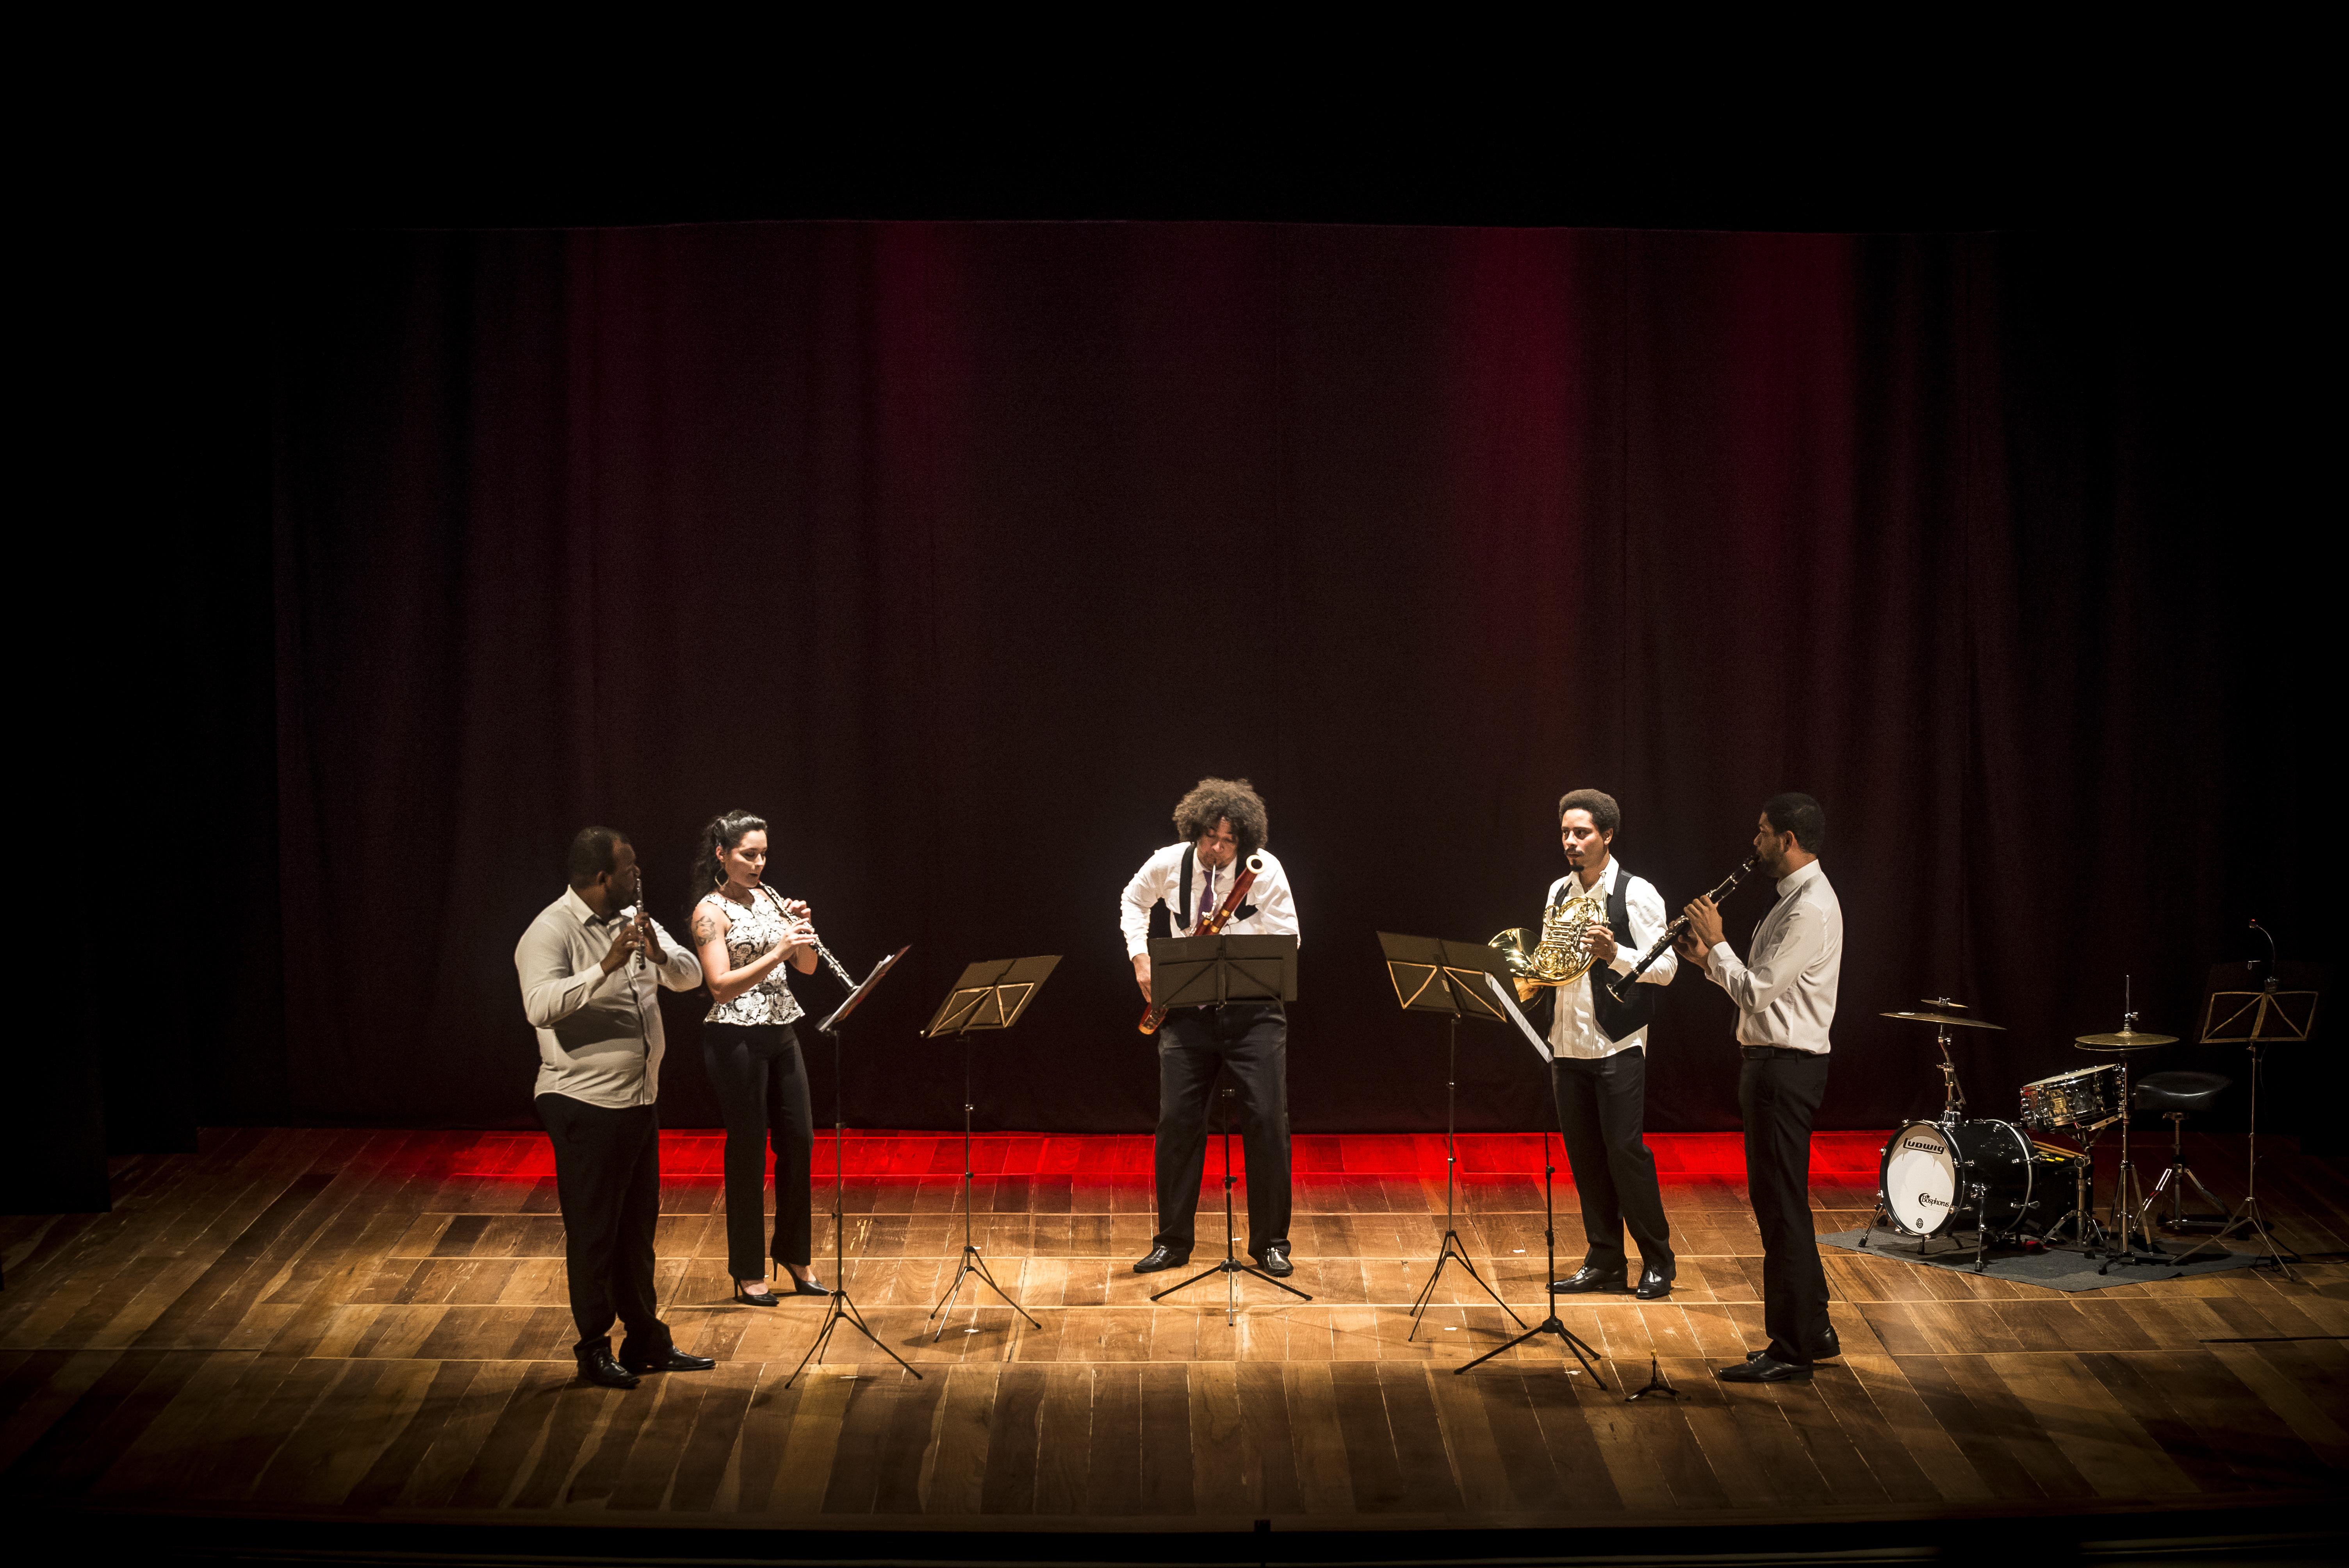 Quinteto Lorenzo Fernandez - Teatro Municipal Niteroi 26-07-17 - 11